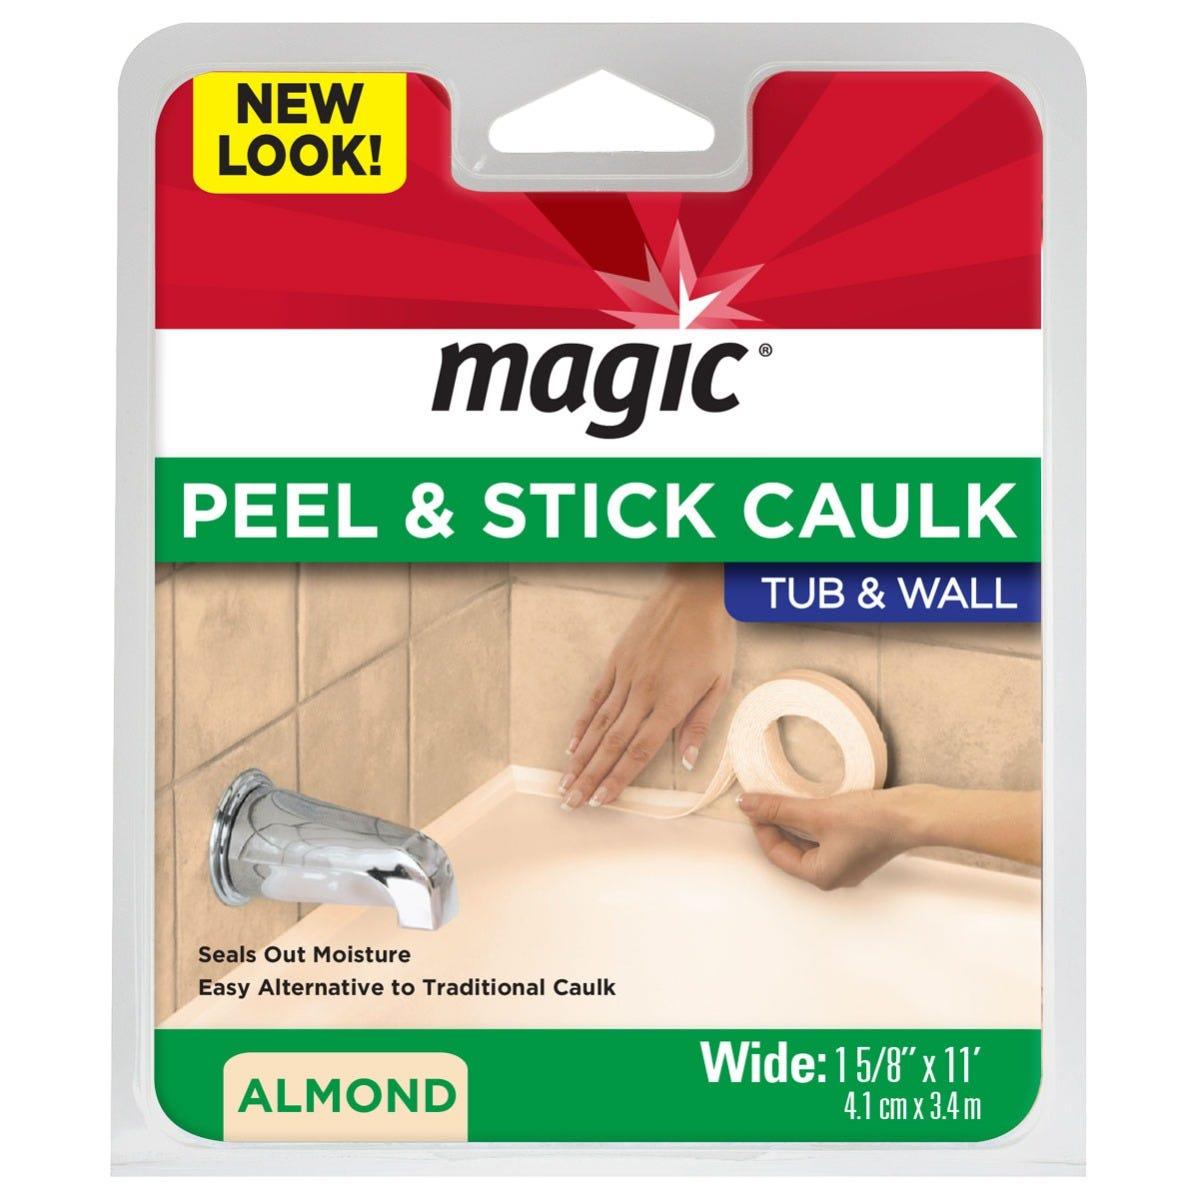 https://googone.com/media/catalog/product/p/e/peel-and-stick-caulk-almond-color_front.jpg